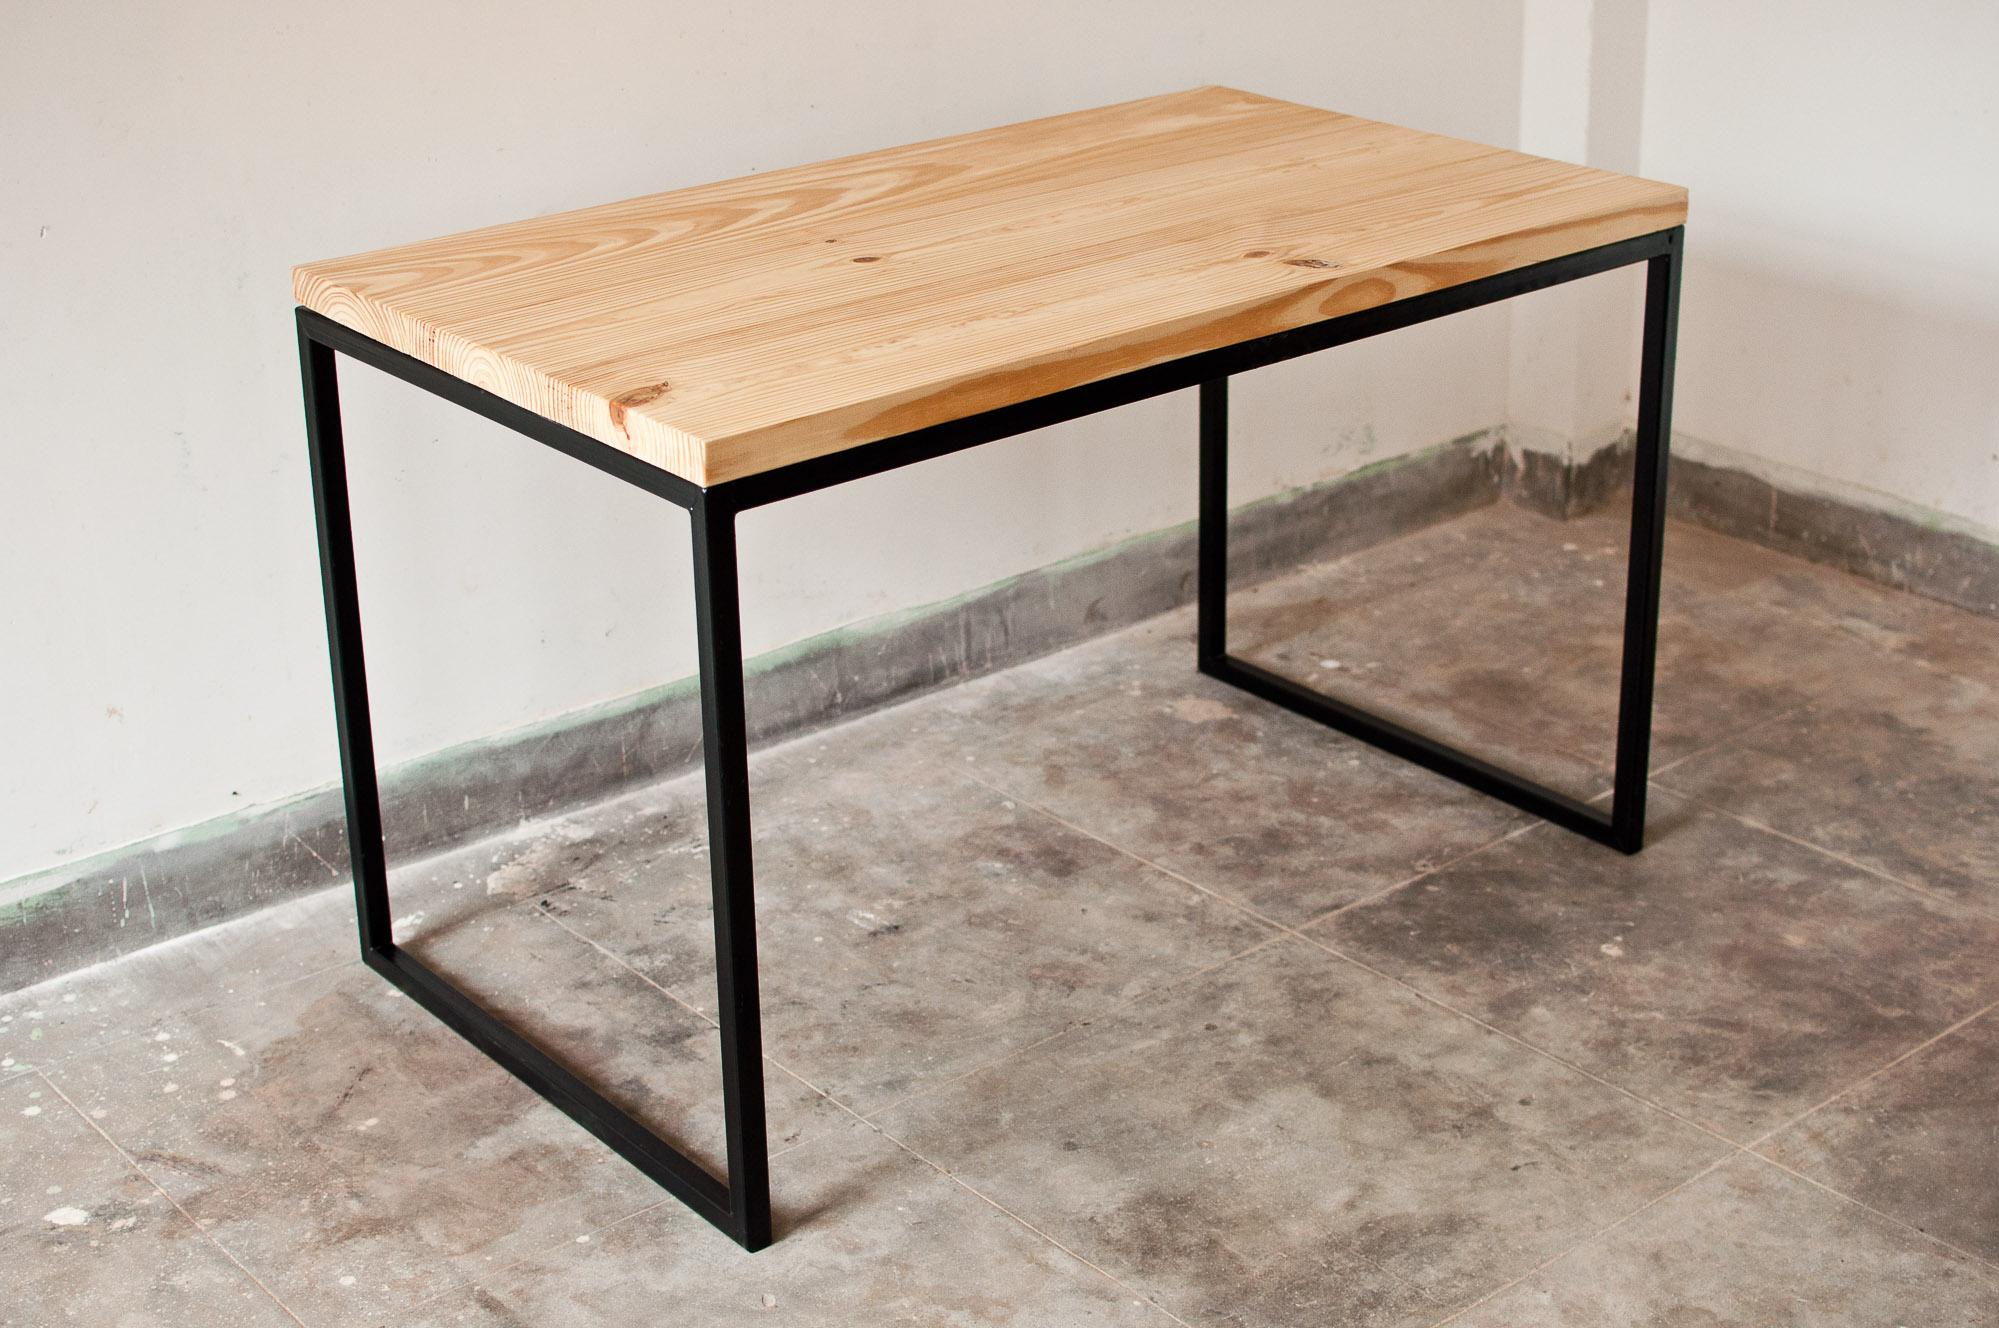 Medium size (M) - Pinewood